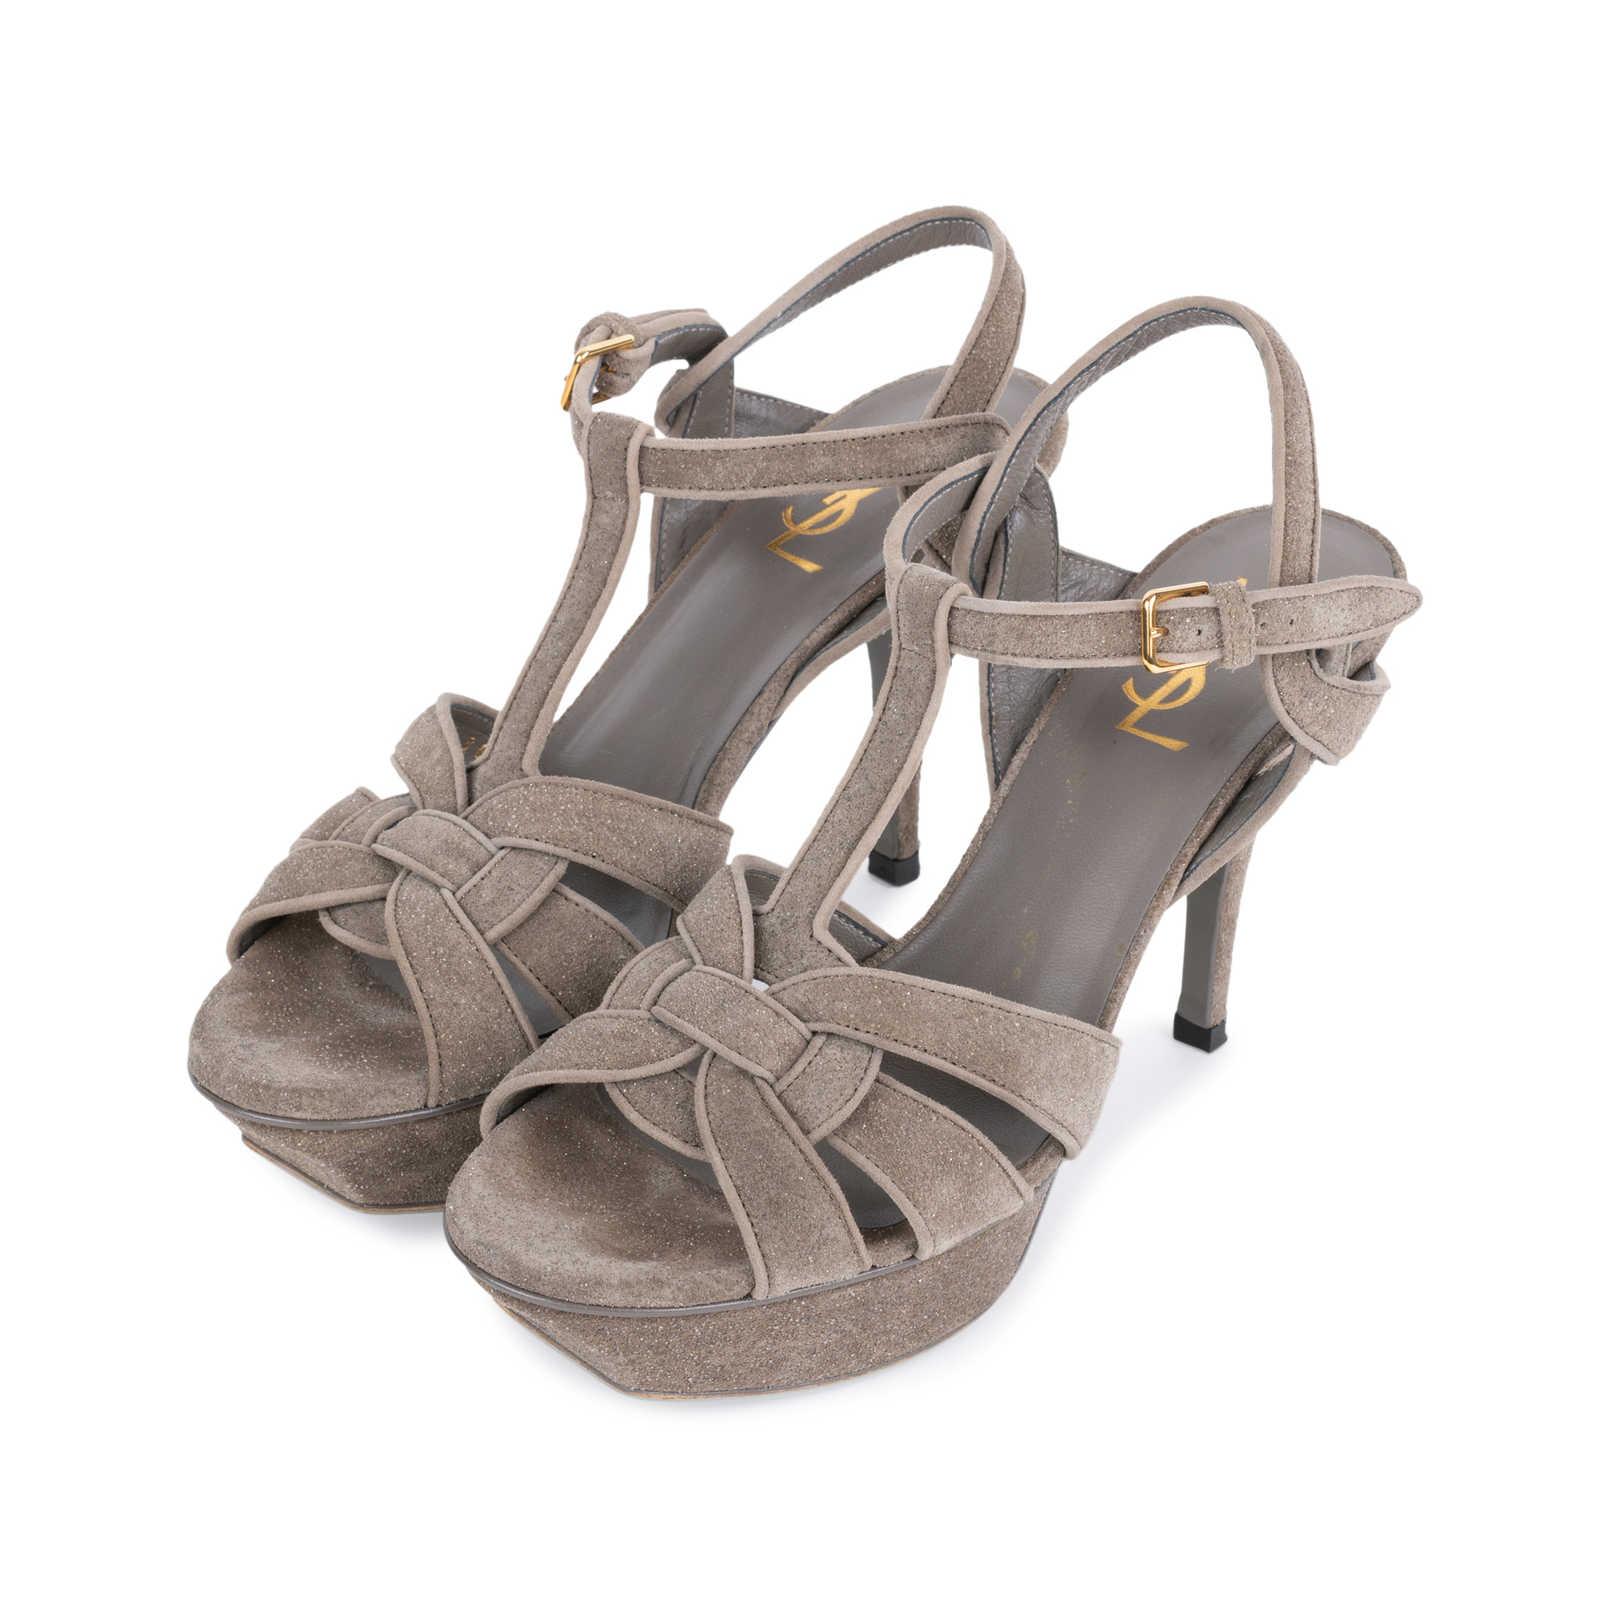 c0a56f9983d ... Authentic Second Hand Yves Saint Laurent Glitter Effect Tribute Sandals  (PSS-328-00019 ...